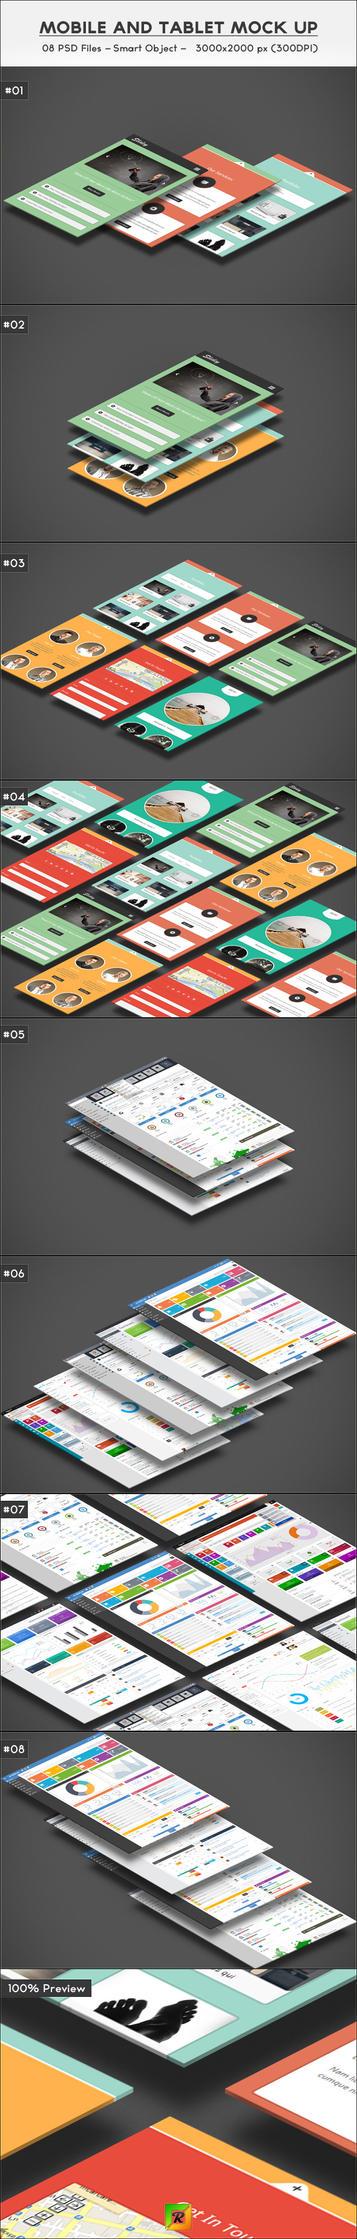 Mobile And Tablet Mock Up by R-DESIGNER